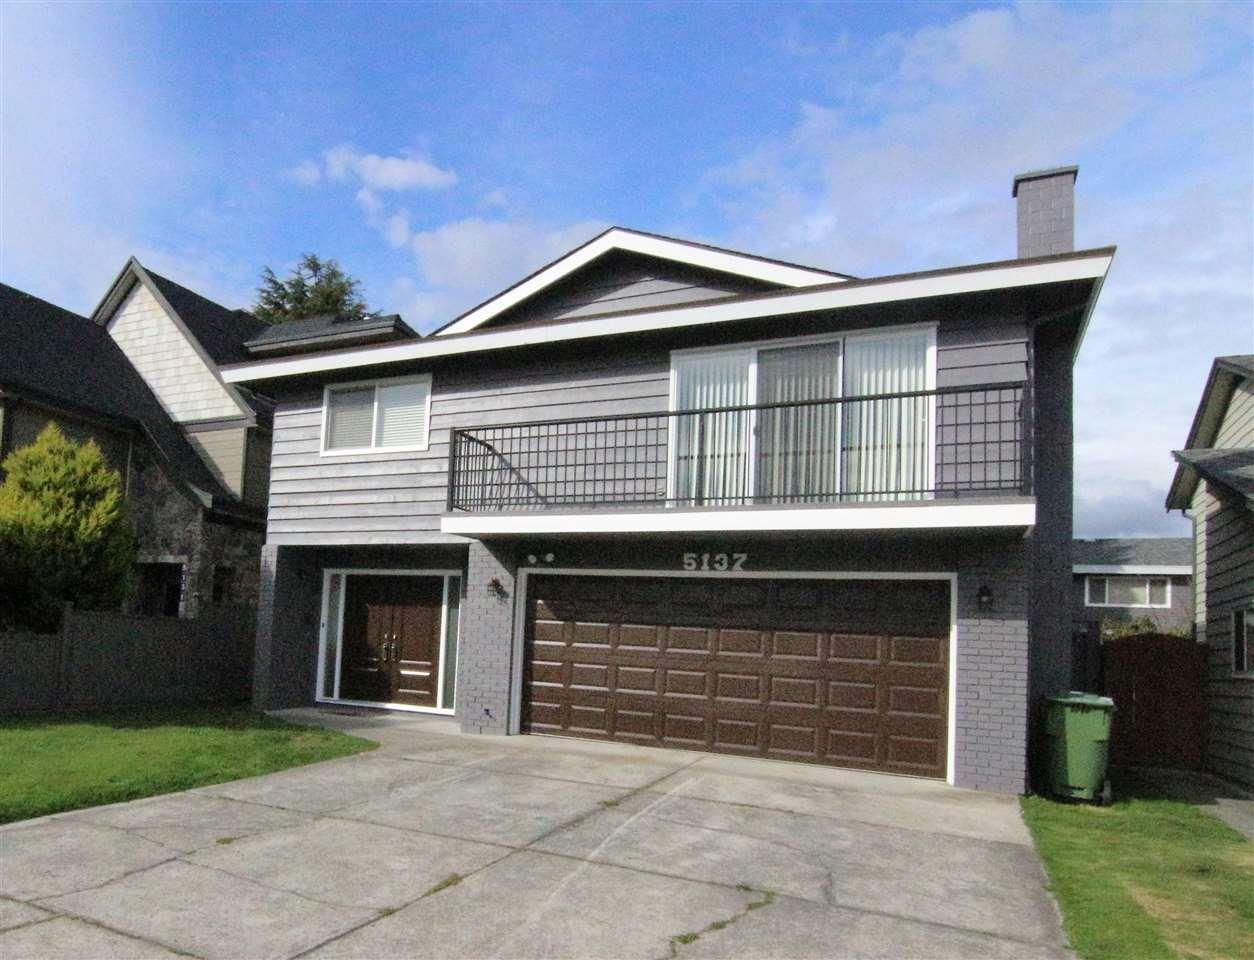 R2113900 - 5137 HOLLYFIELD AVENUE, Steveston North, Richmond, BC - House/Single Family